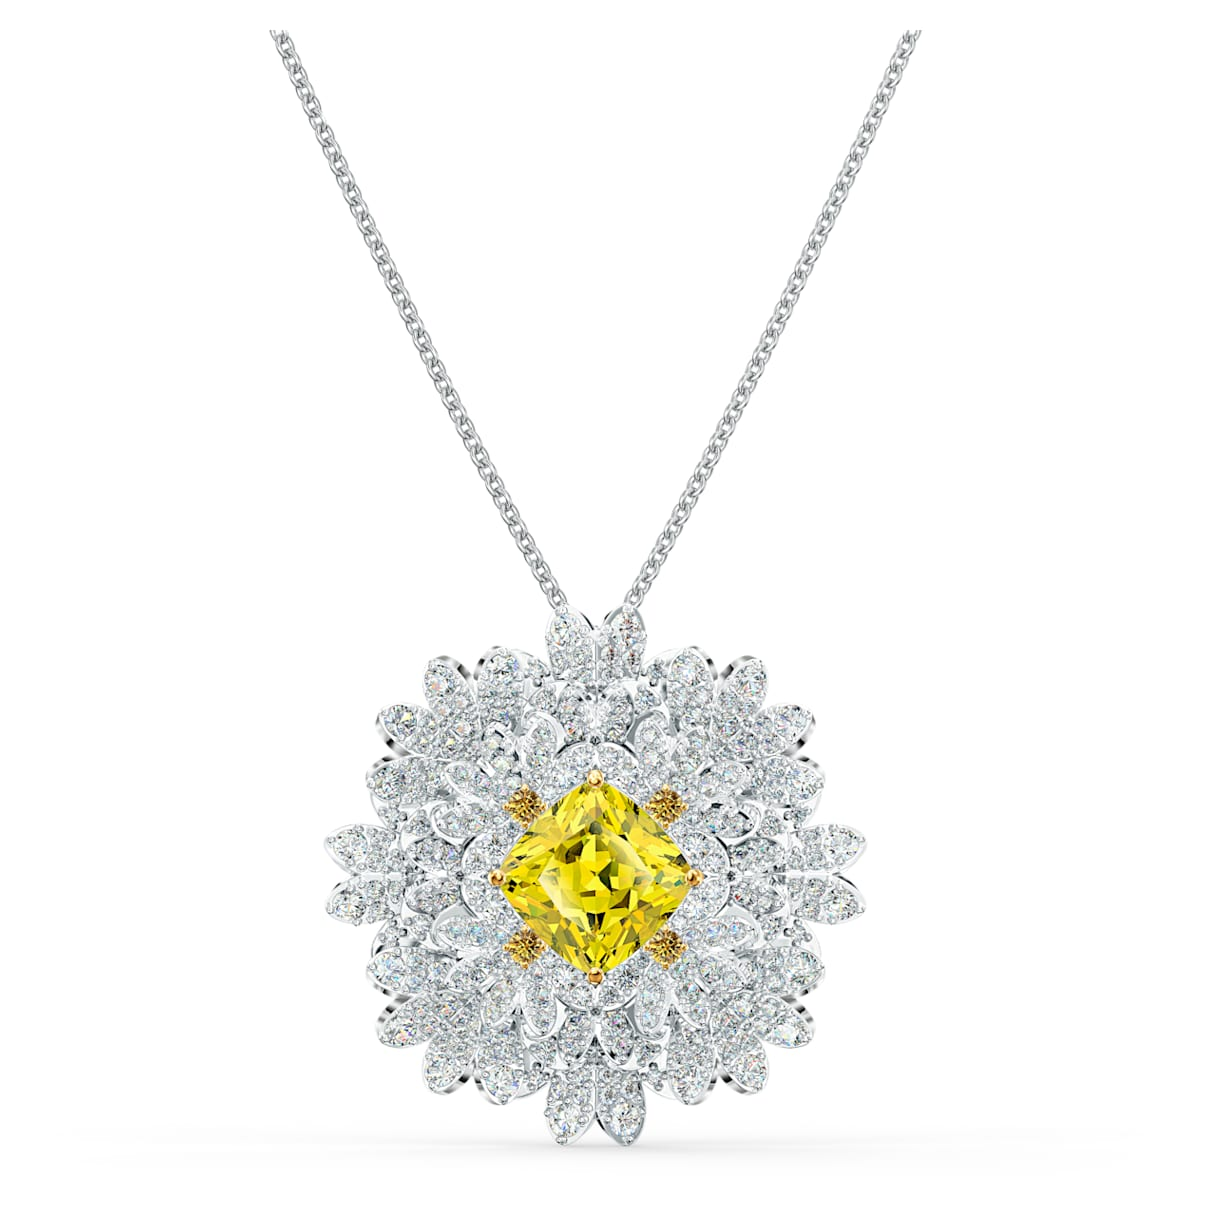 Spilla Eternal Flower, giallo, mix di placcature